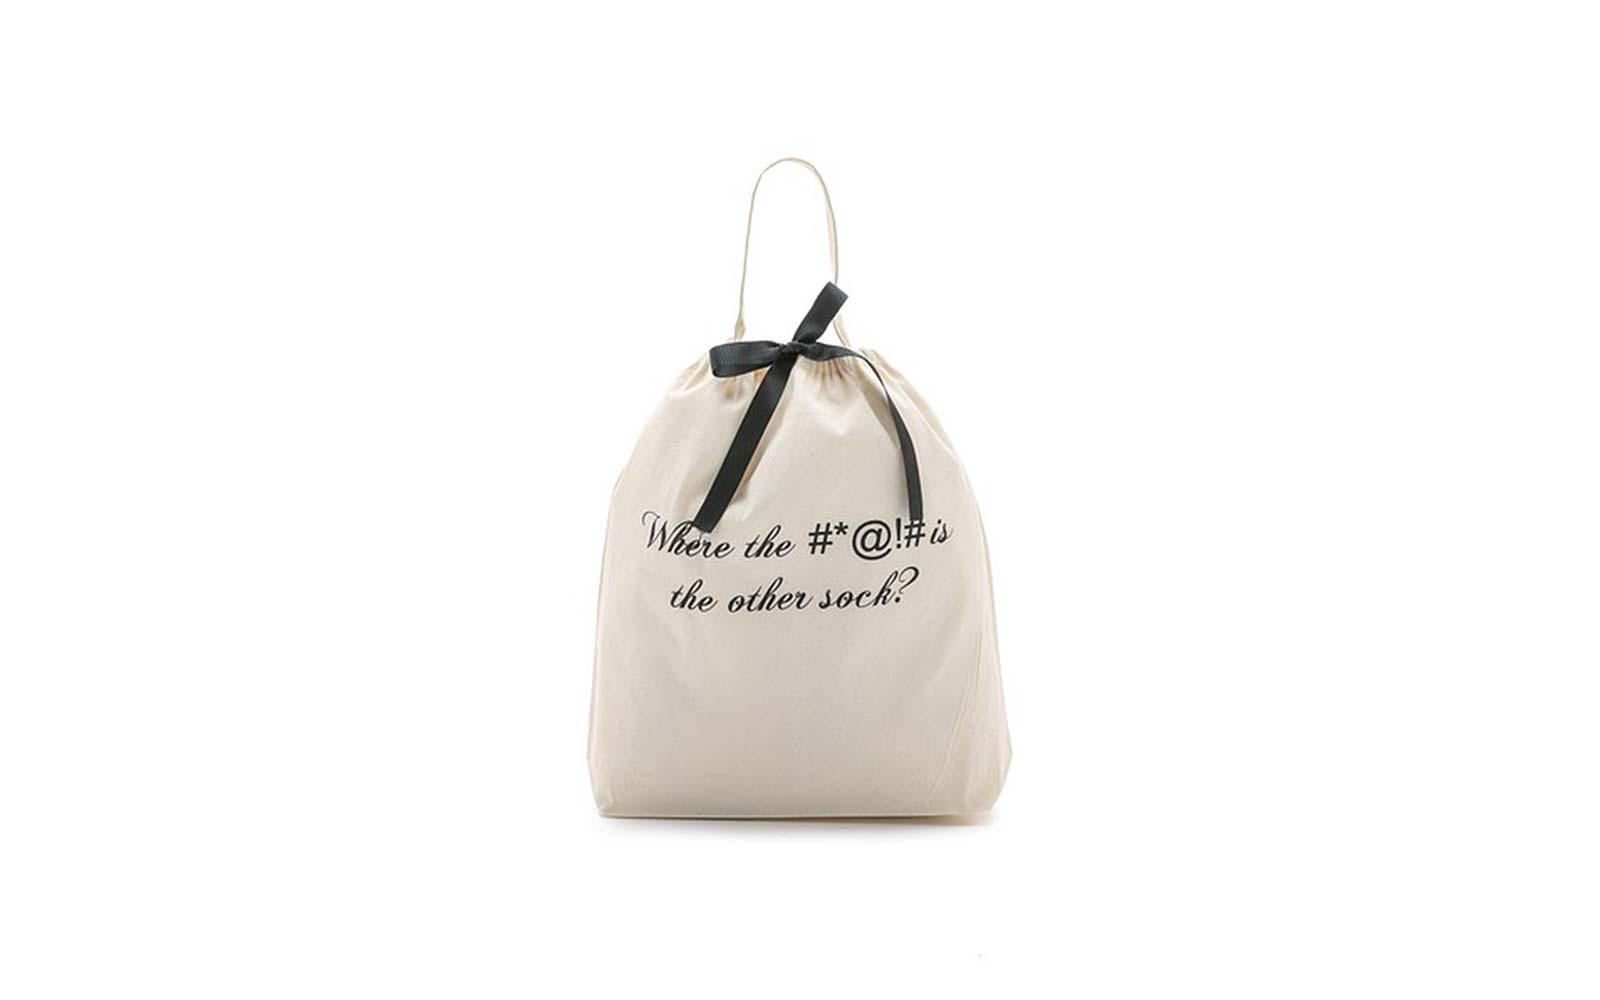 Bag All Lost Sock Travel Bag Gift Guide Under $25